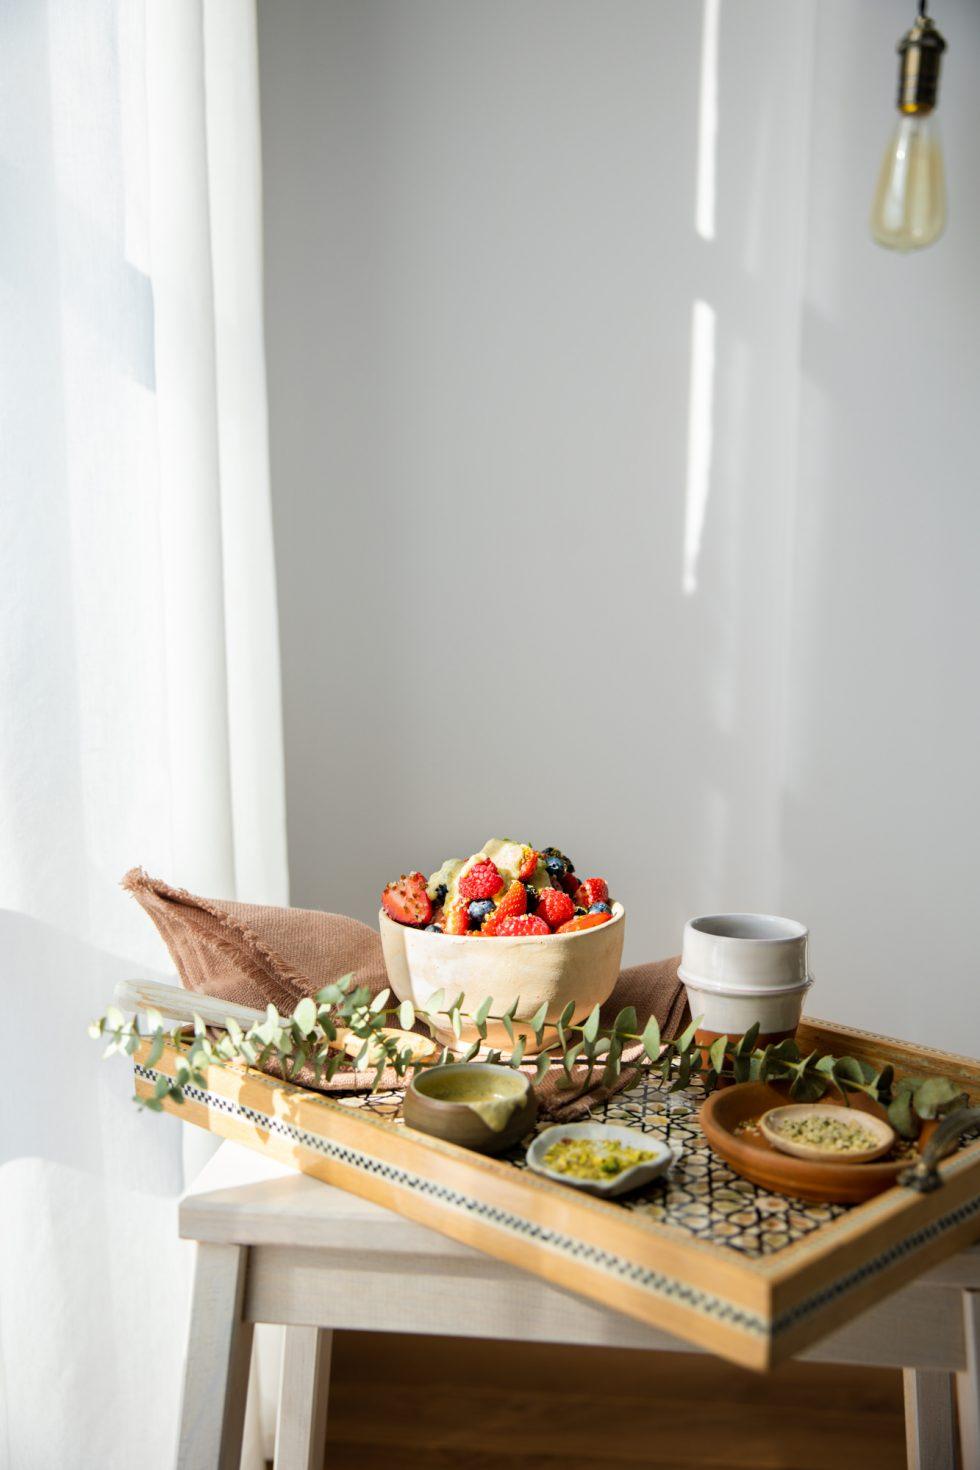 genevieve-plante-vegan-salad-recipe-book-lifestyle-photographer-laura-g-diaz